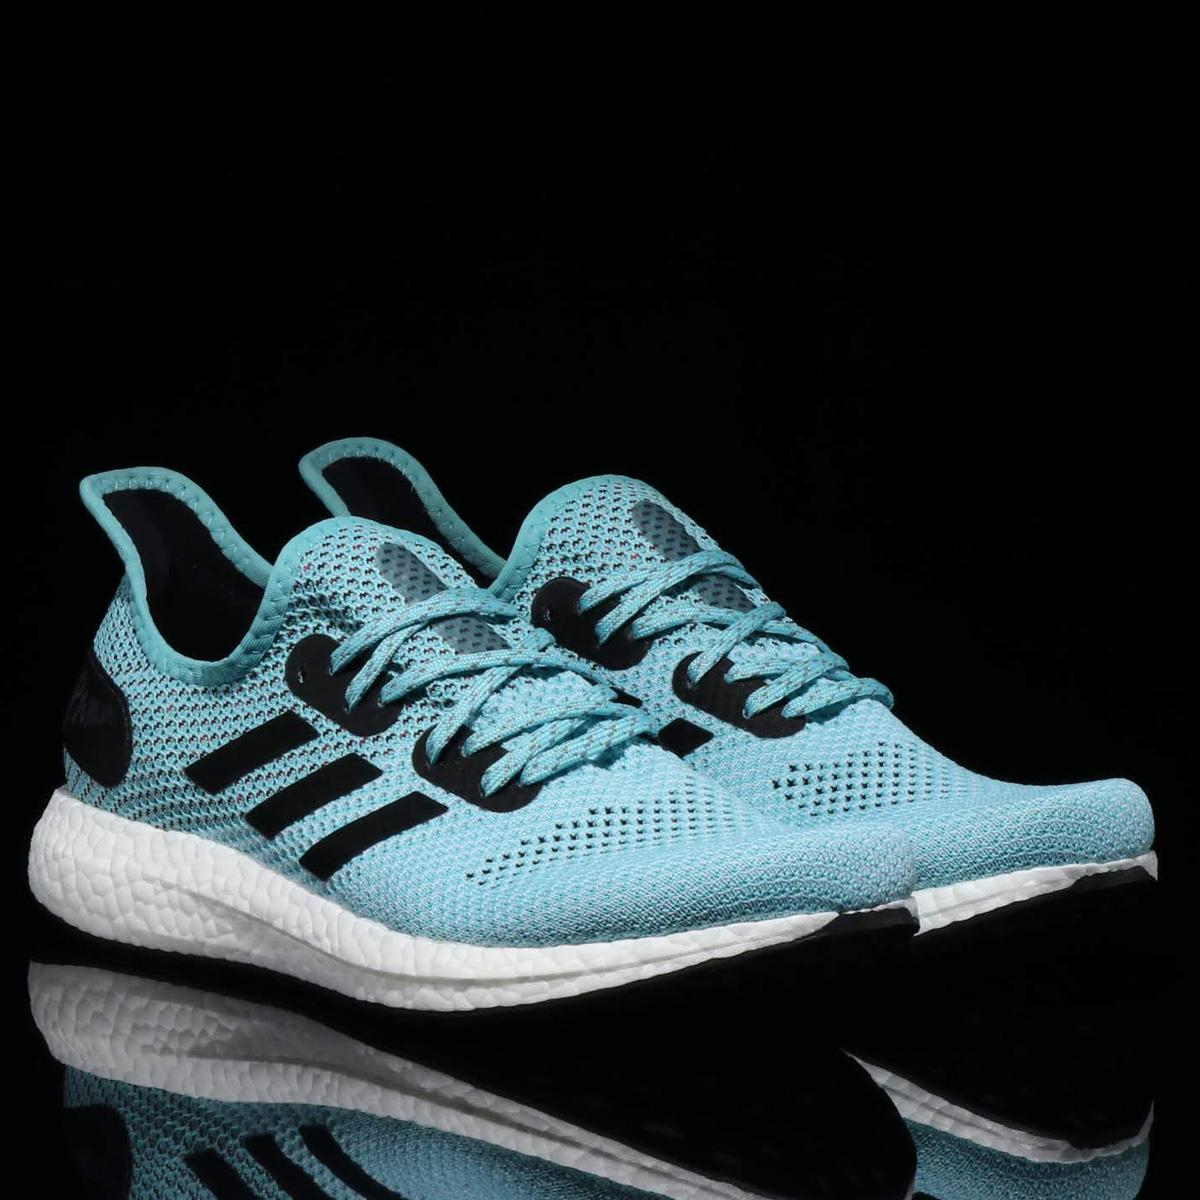 adidas AM4LA(アディダス エイエムフォー) BLUE SPIRIT/CORE BLACK/REAL PINK【メンズ スニーカー】18FW-S